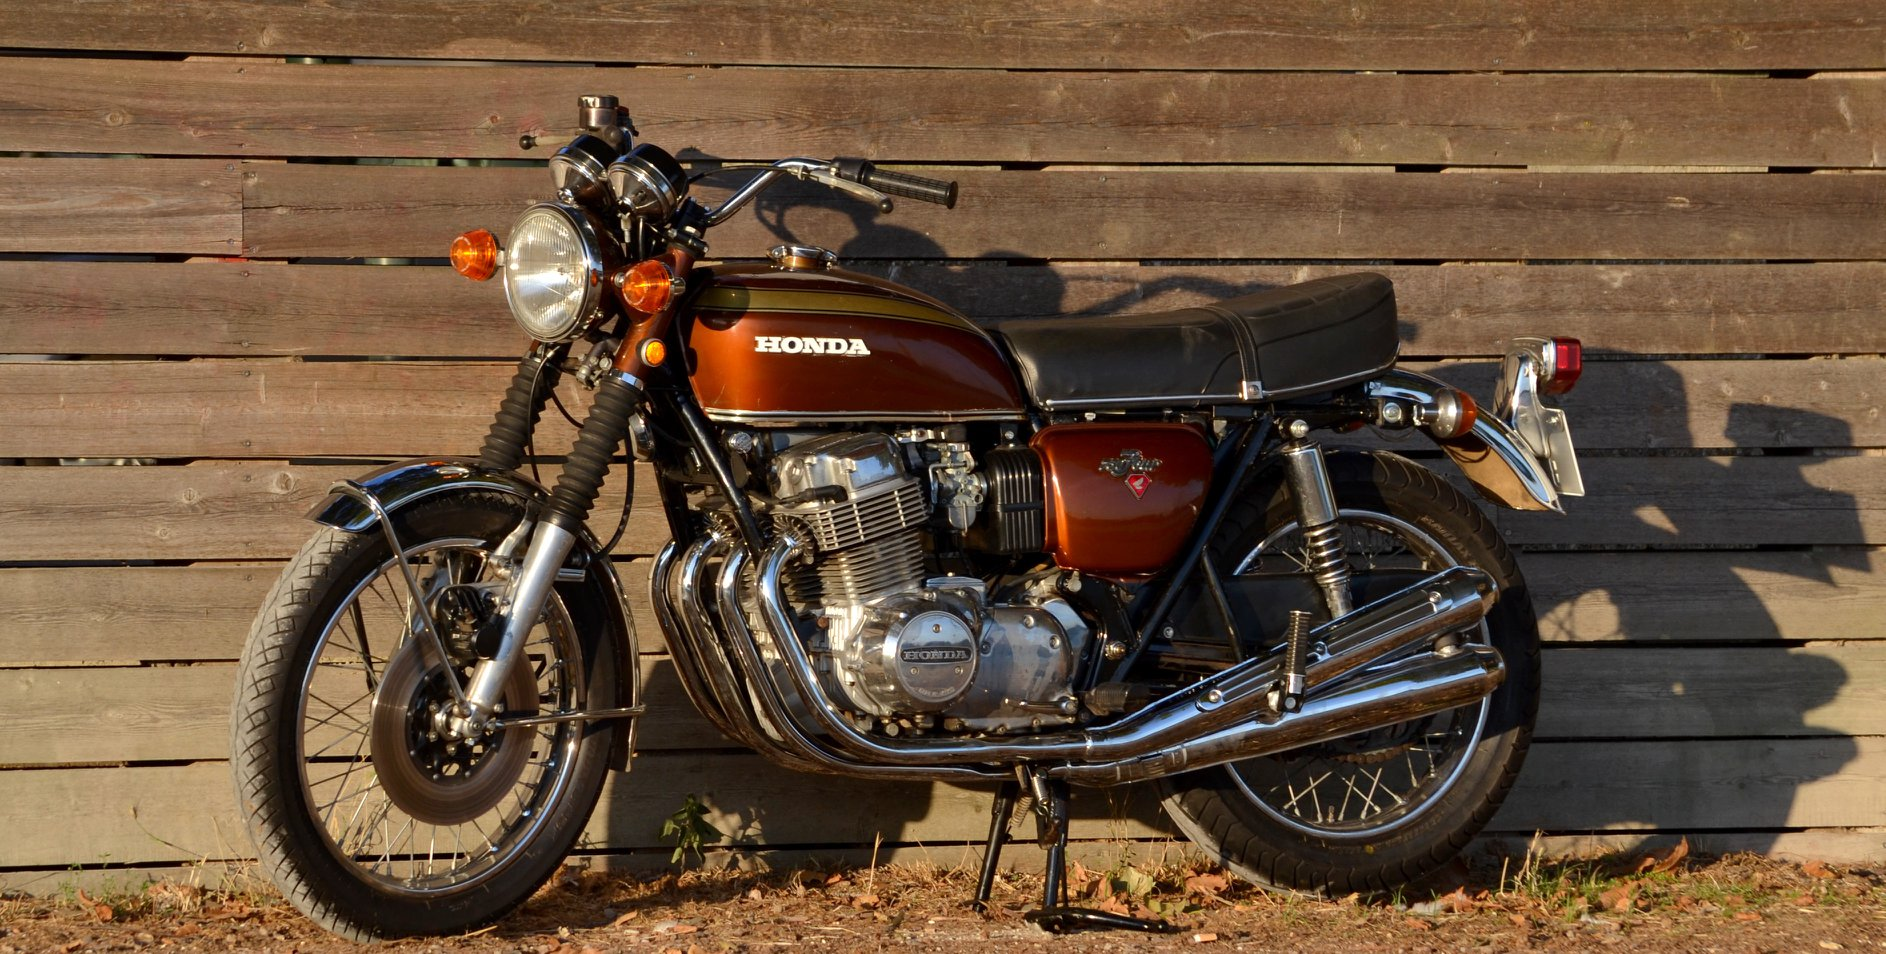 Honda CB 750 K1 Garnet Brown 11